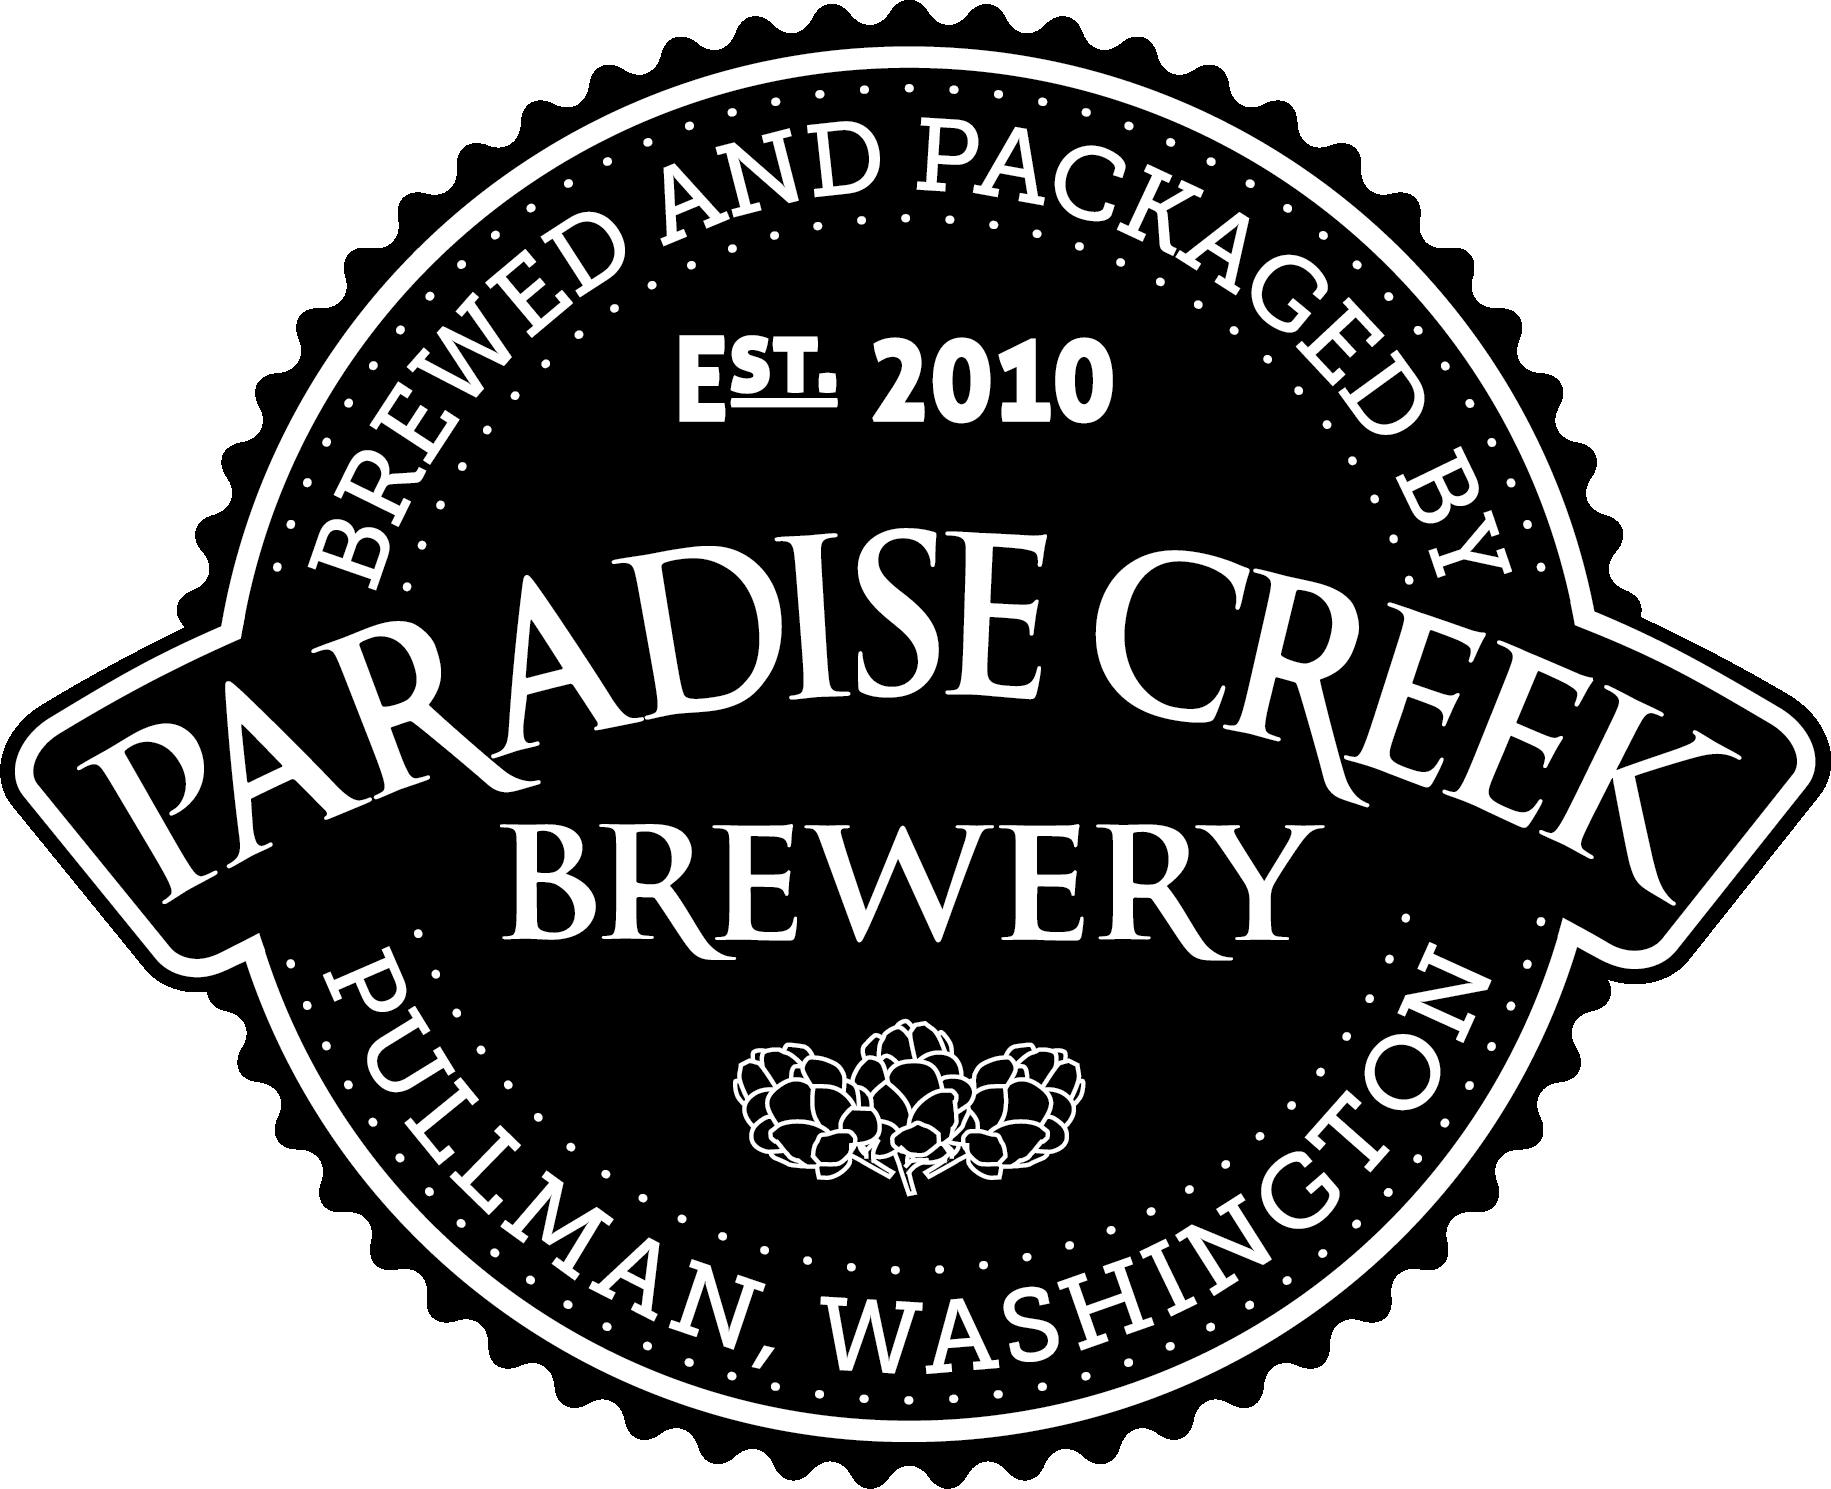 ParadiseCreek.png